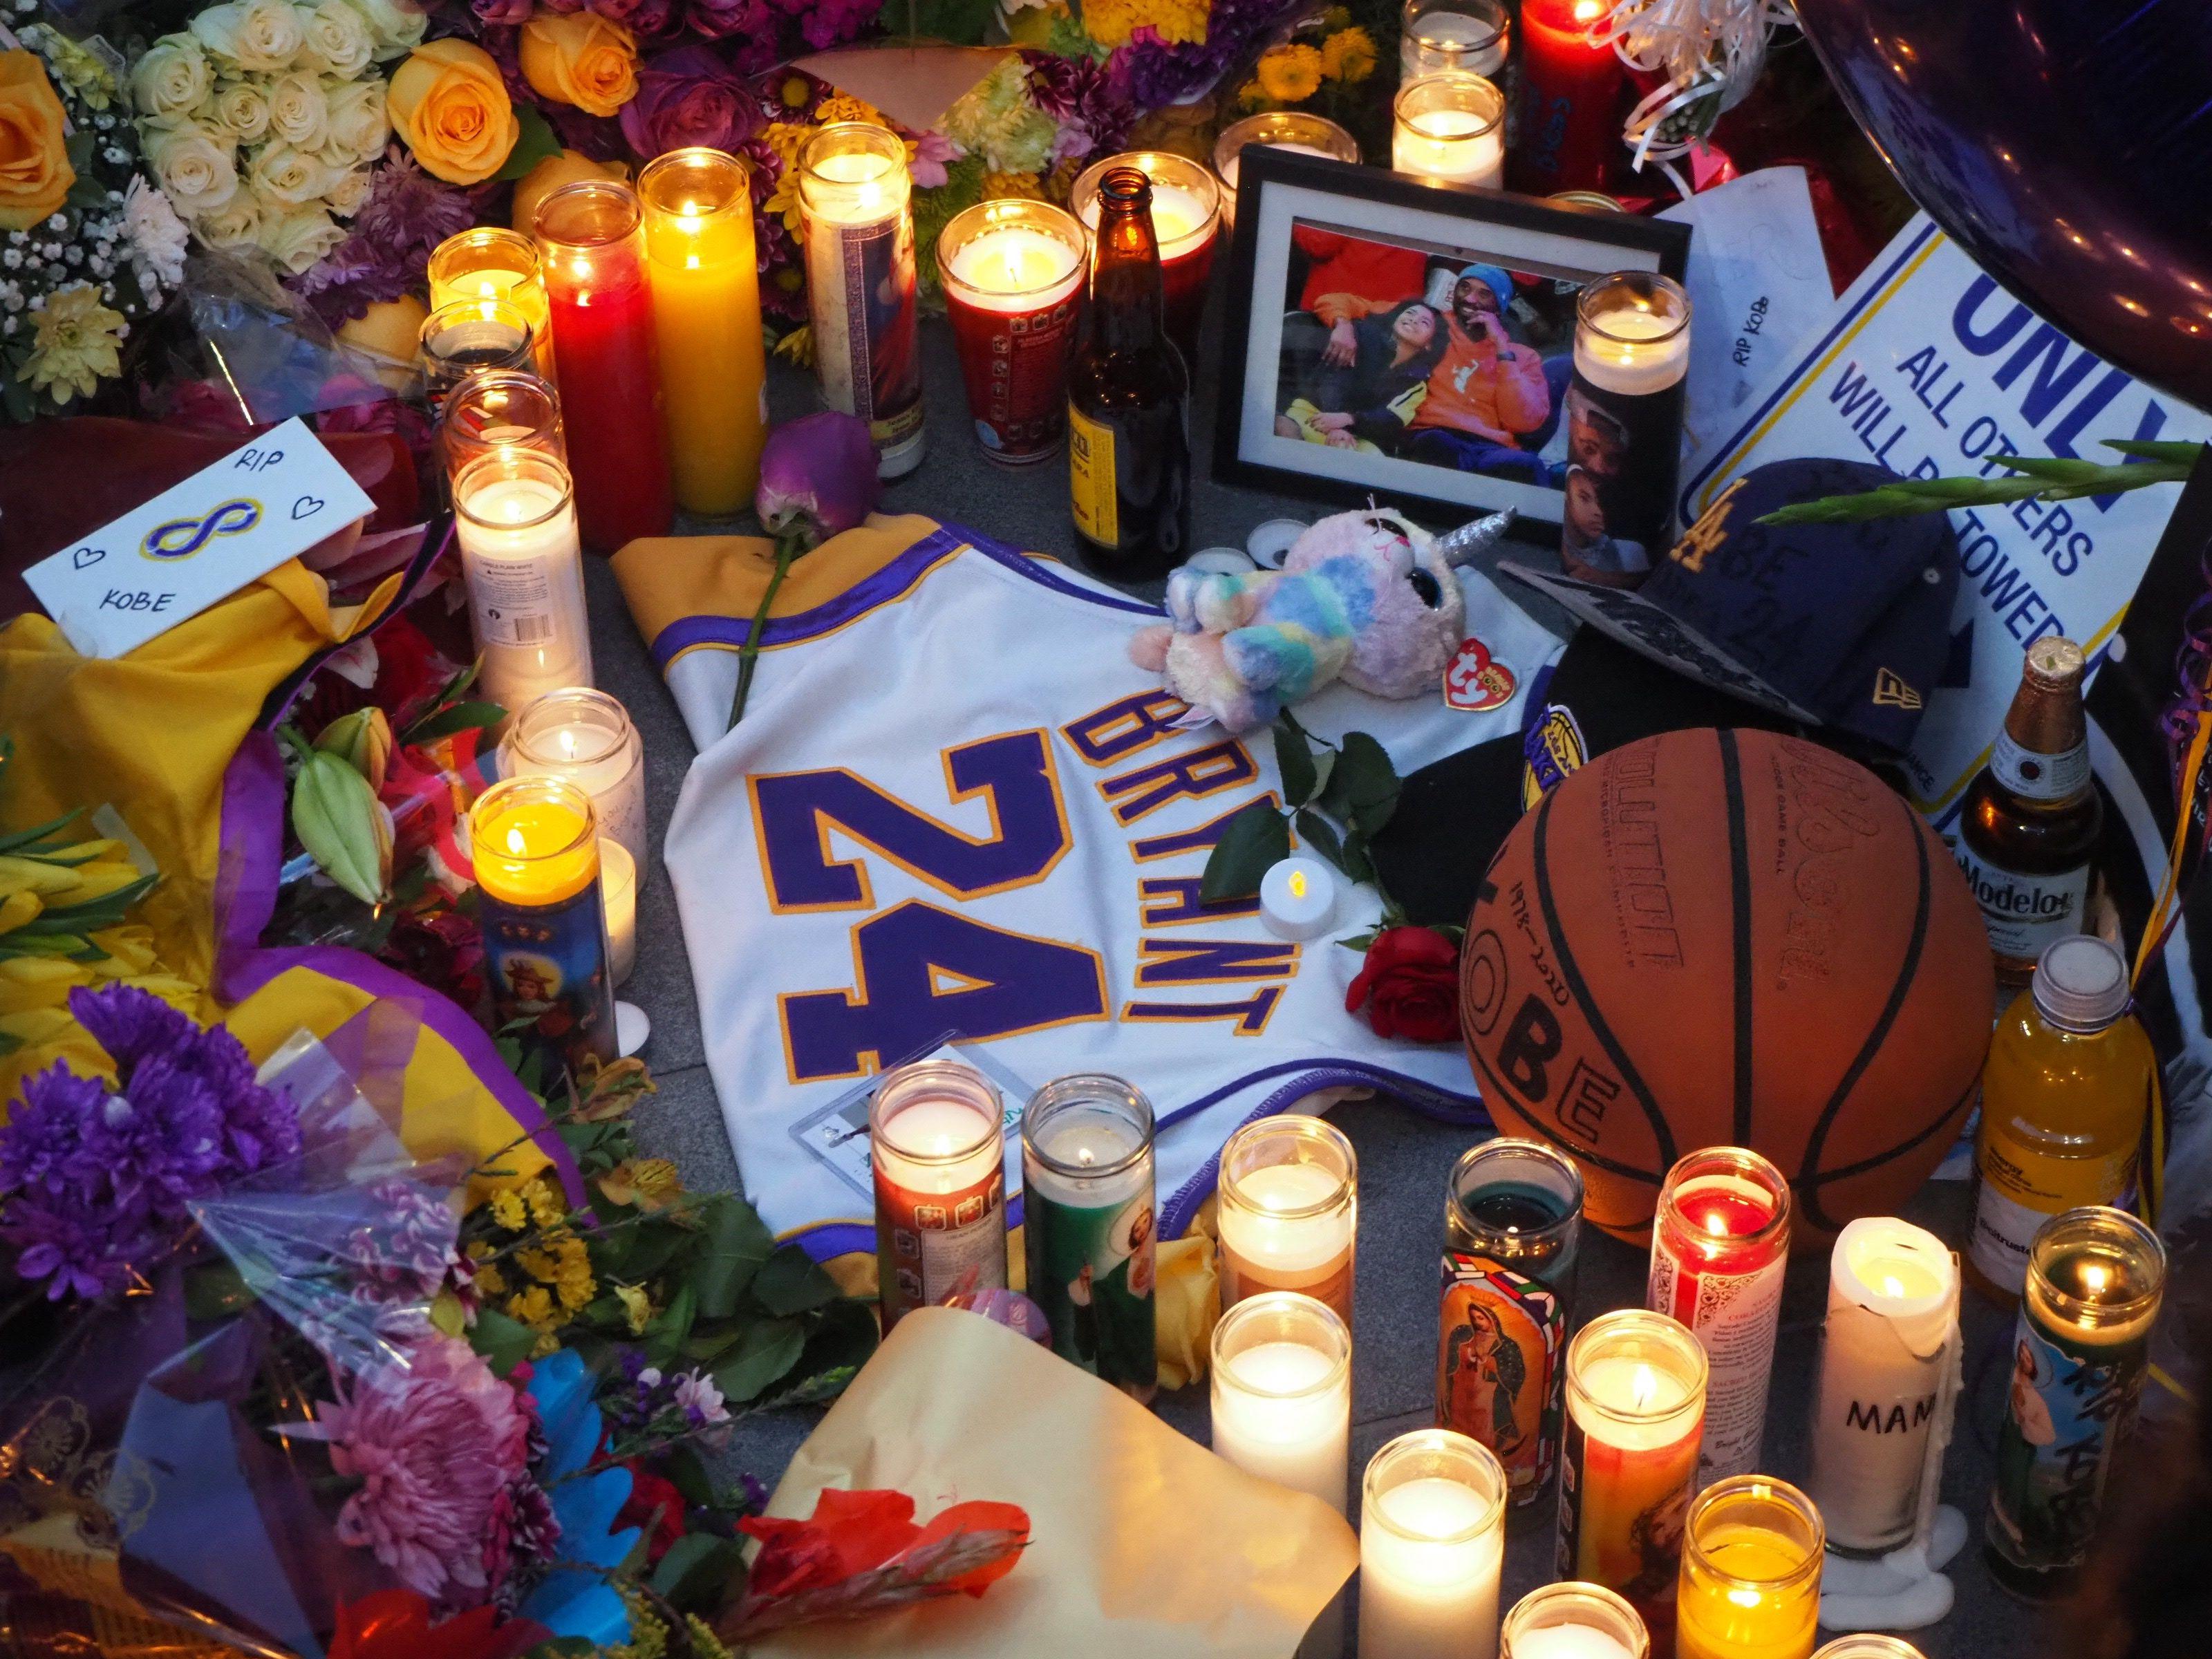 Memorial to Kobe Bryant